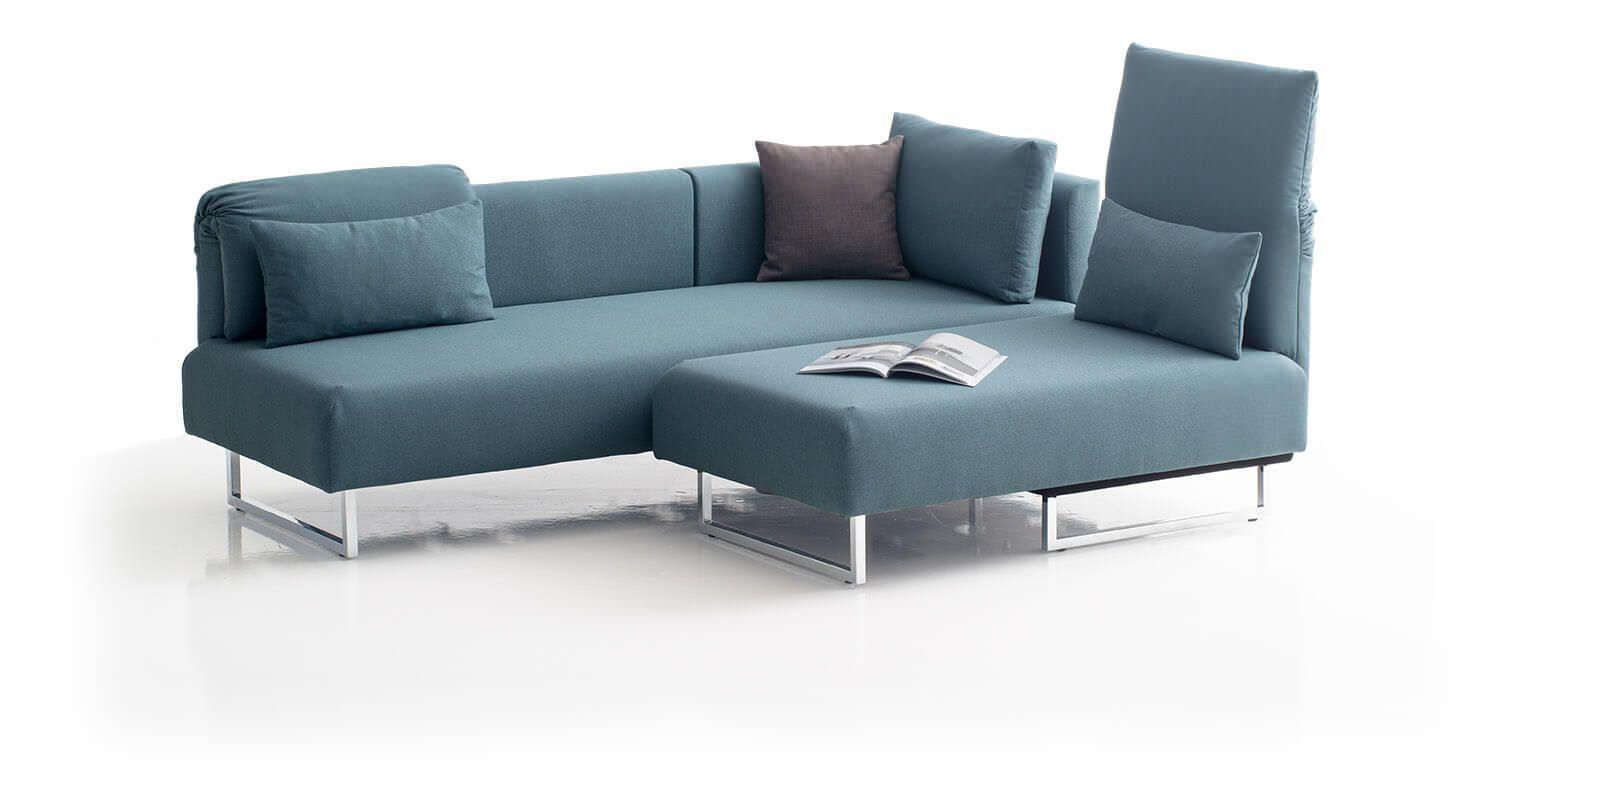 - Bed Sofa / Corner / Modular / Contemporary SCOTT By C. Heck Die